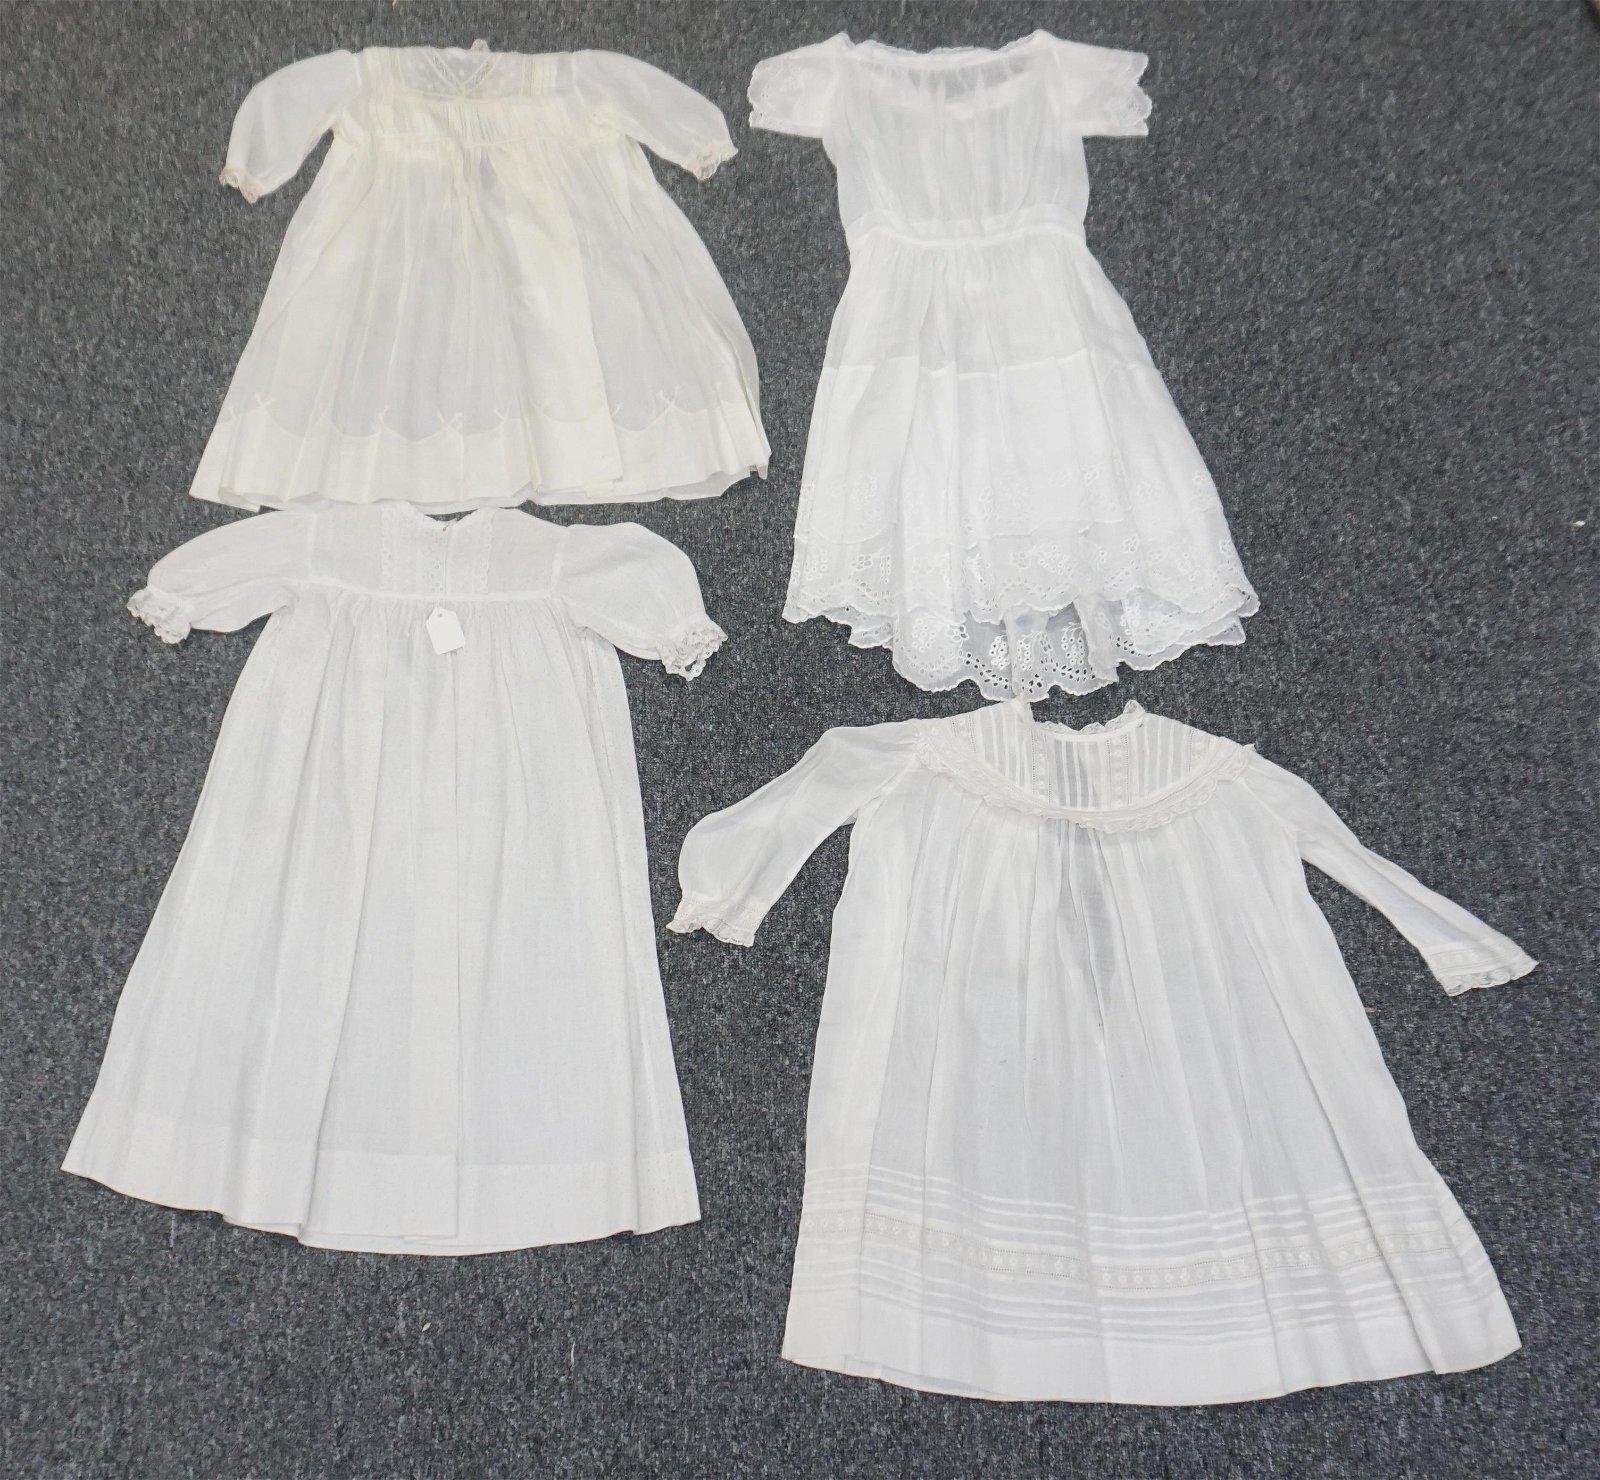 4 VICTORIAN GIRLS DRESSES +